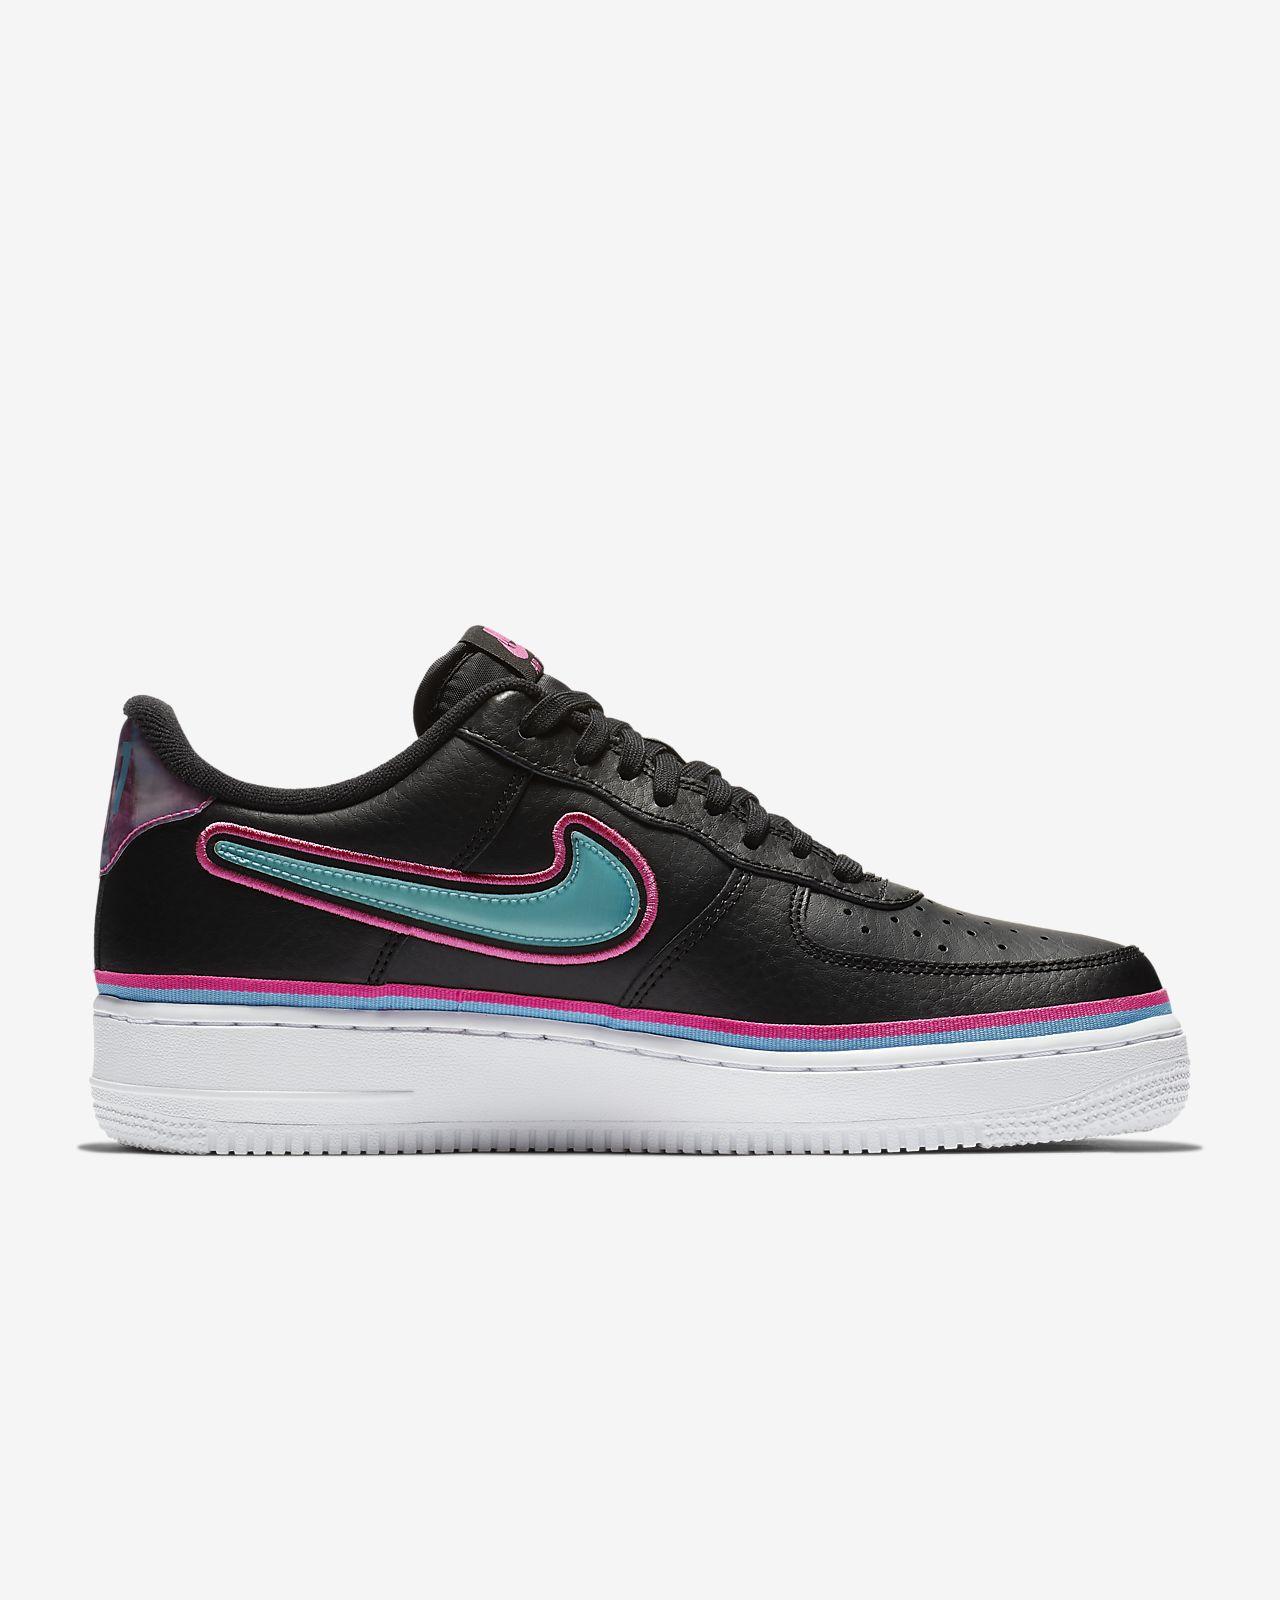 new arrival a619a 5f08d ... Nike Air Force 1  07 LV8 Sport NBA Shoe